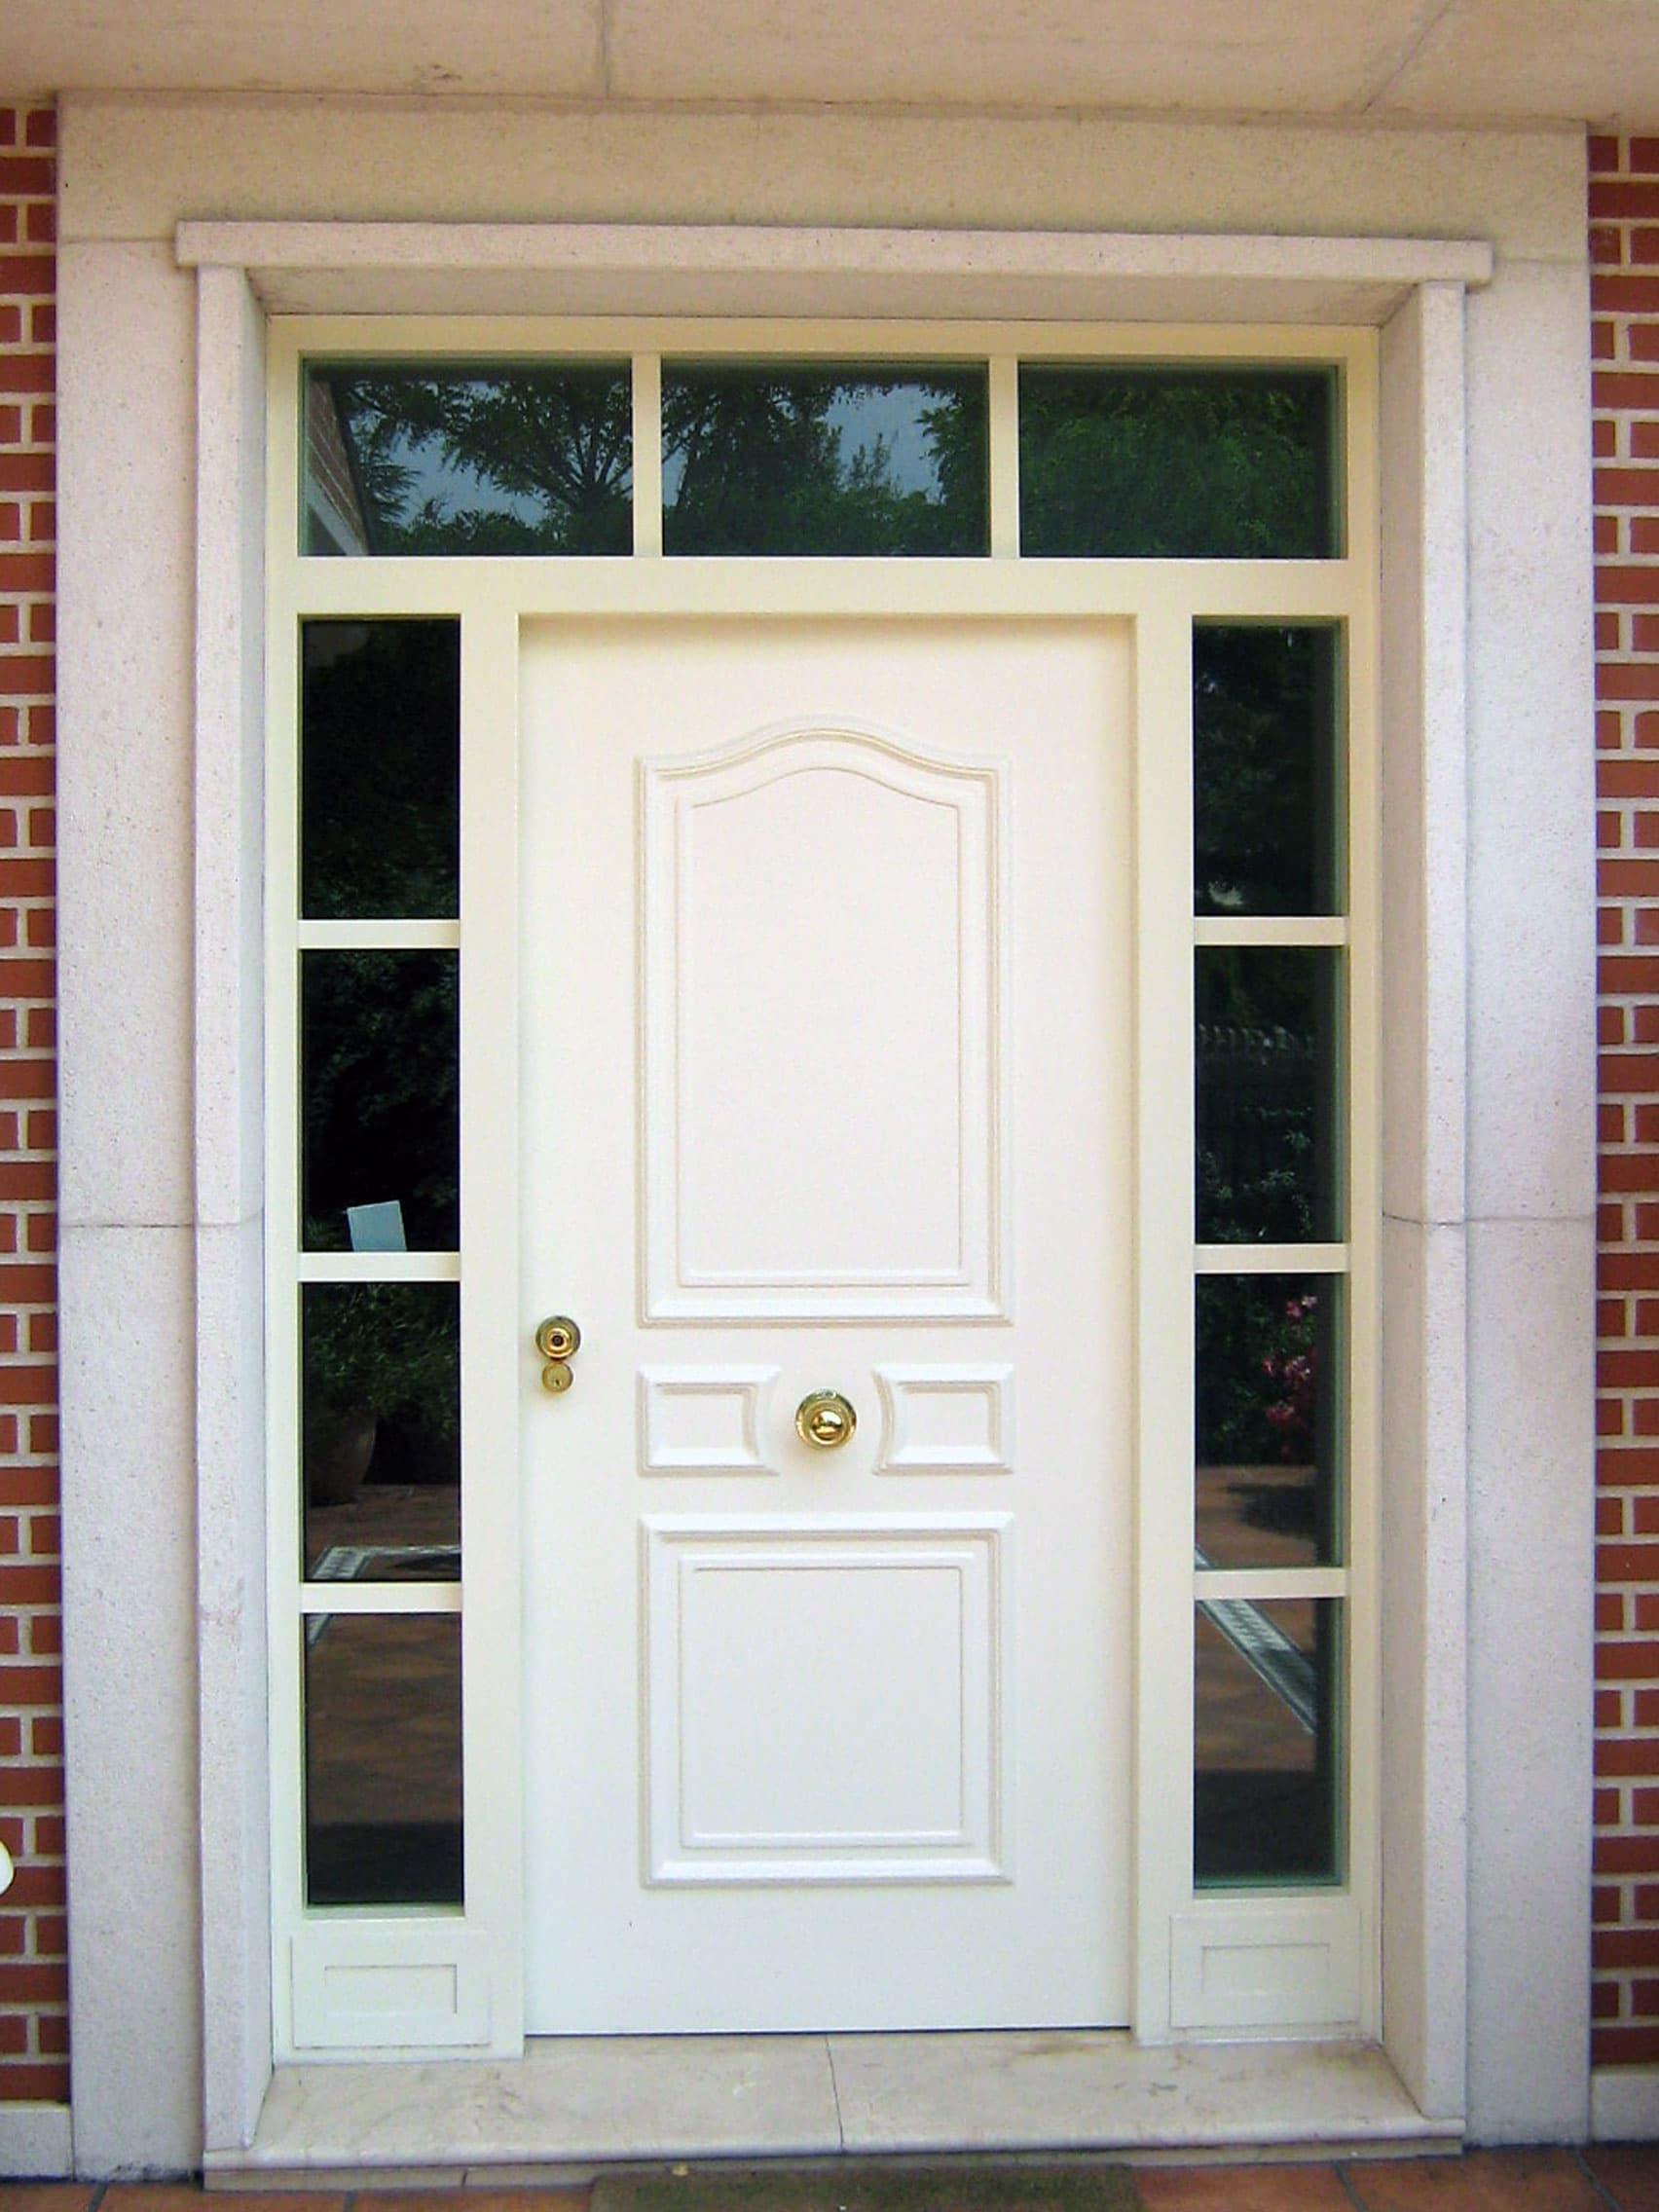 Una puerta acorazada hecha para ti fichetmadrid - Puerta acorazada madrid ...